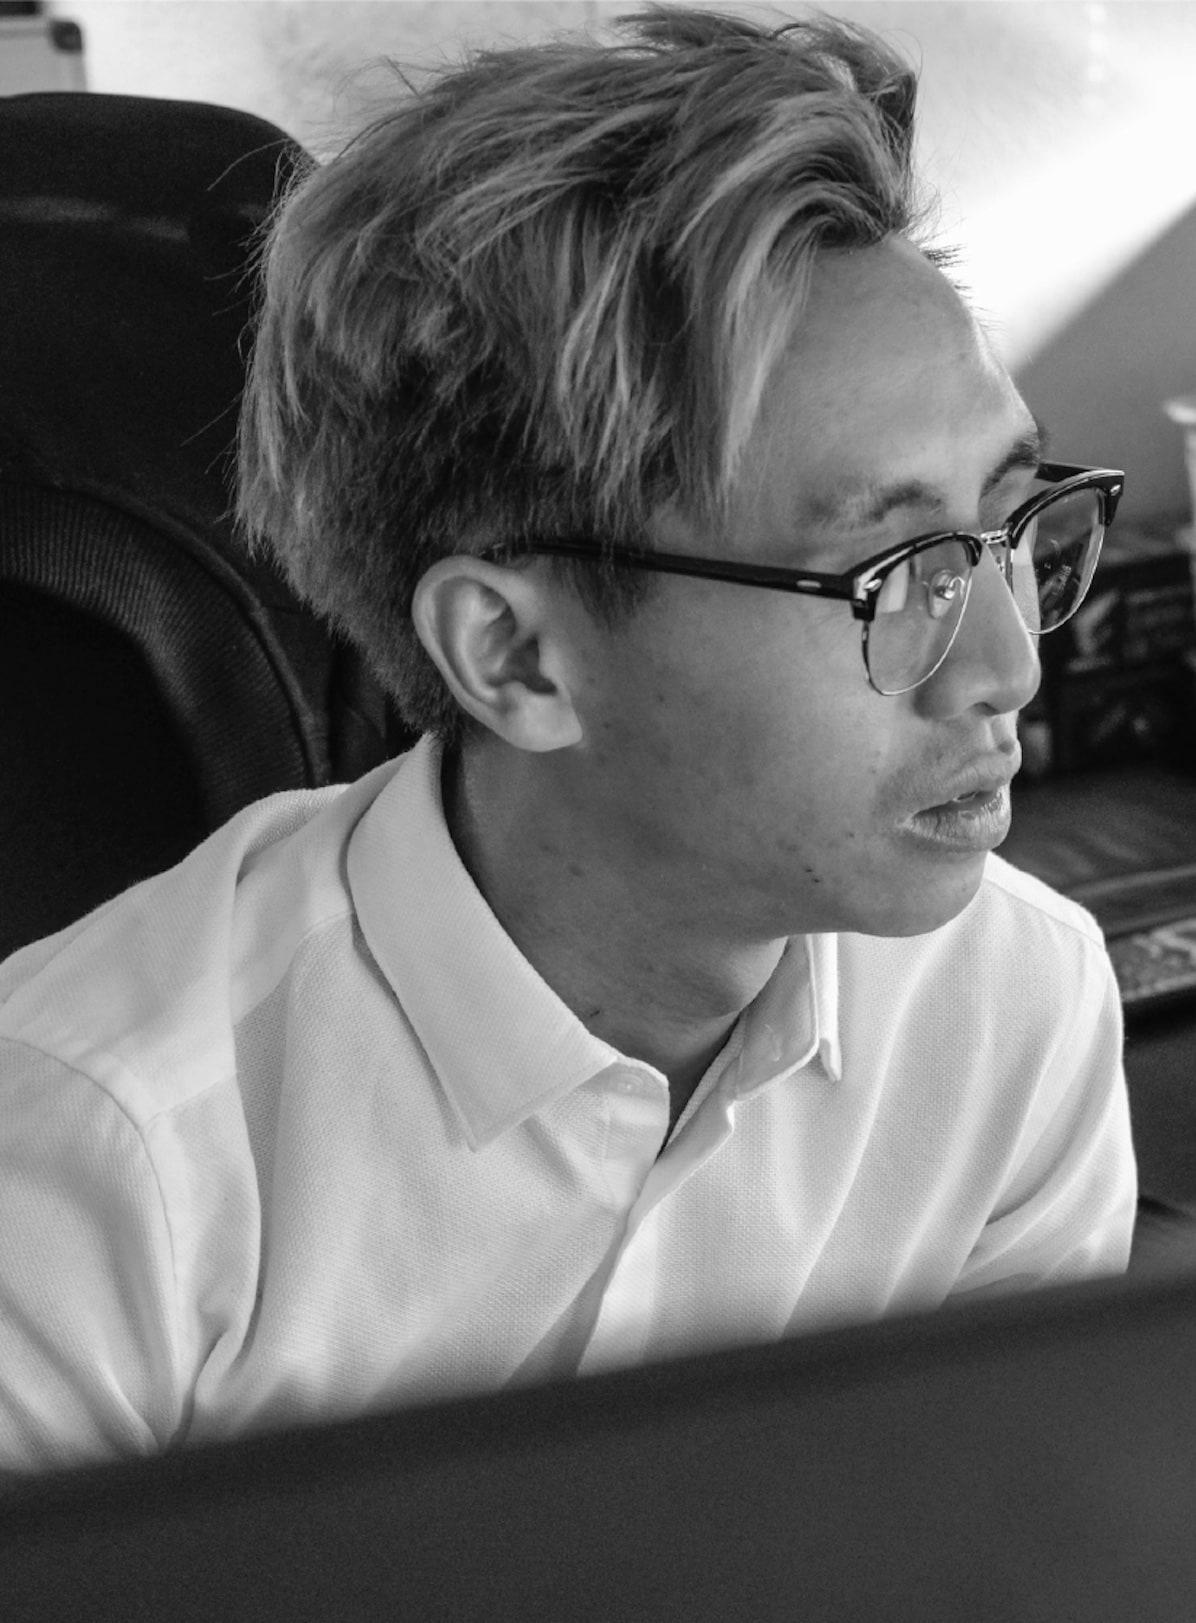 Jemis King-Chung Lau